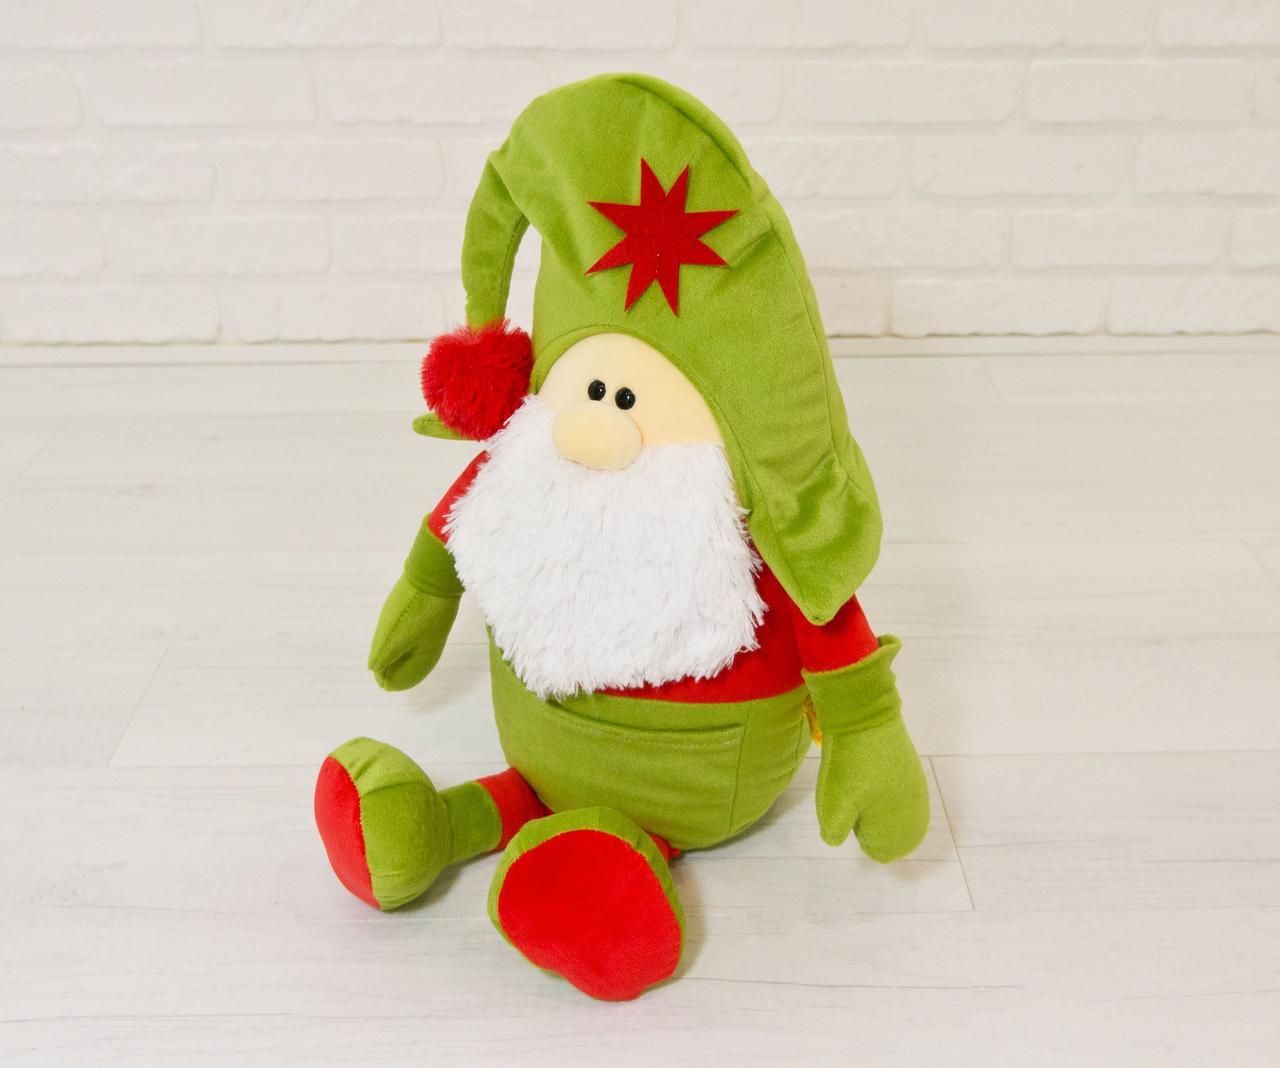 Мягкая игрушка Kidsqo Гномик Санта оливкового цвета